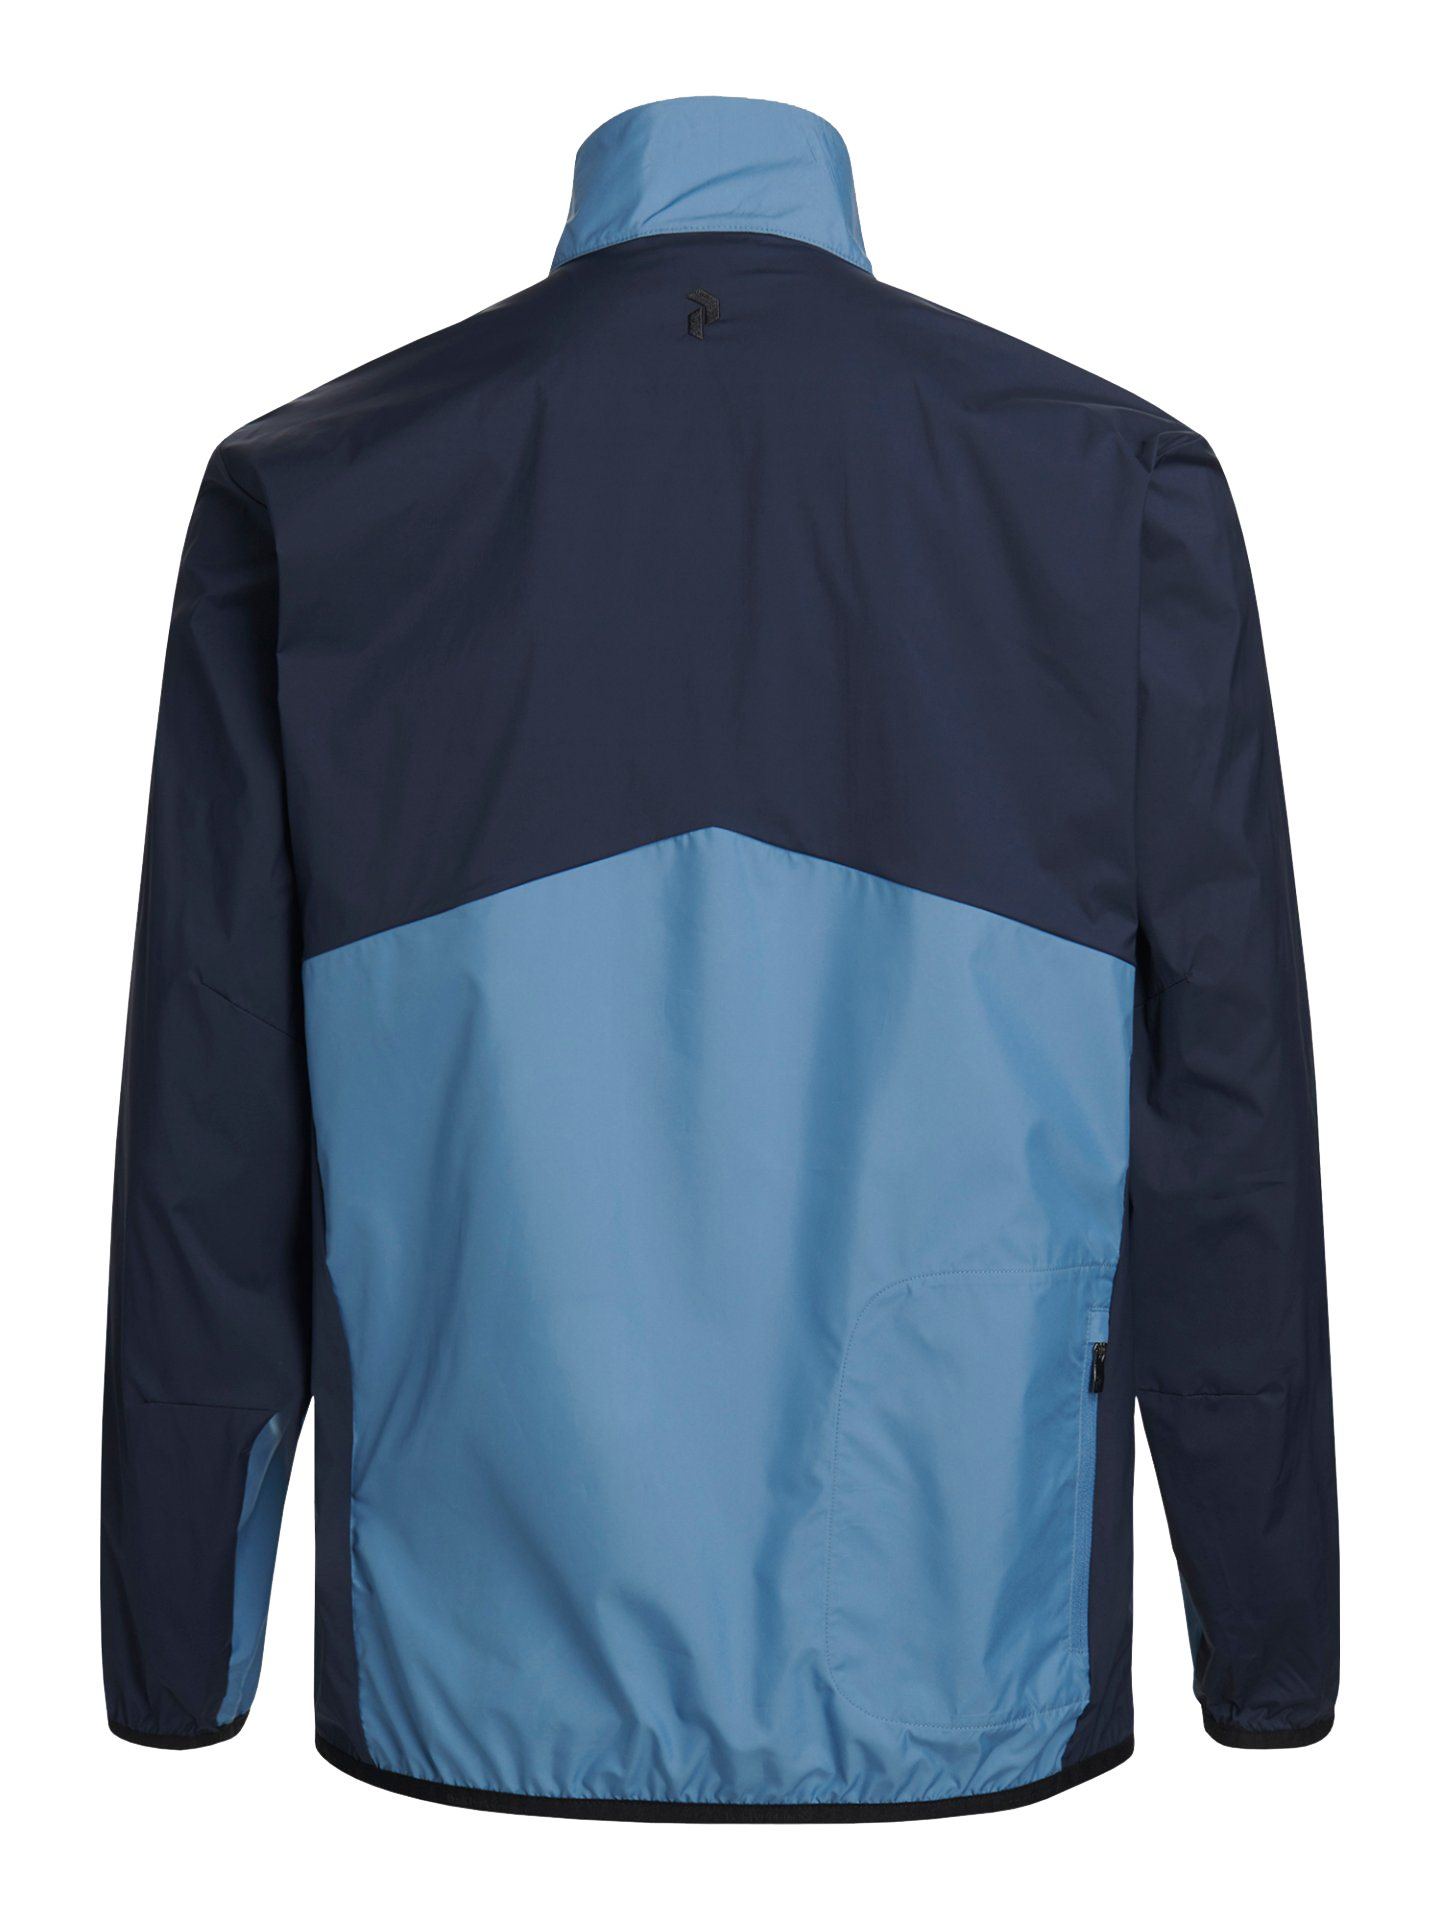 Peak Performance heren golfjack Meadow Windbreker blauw